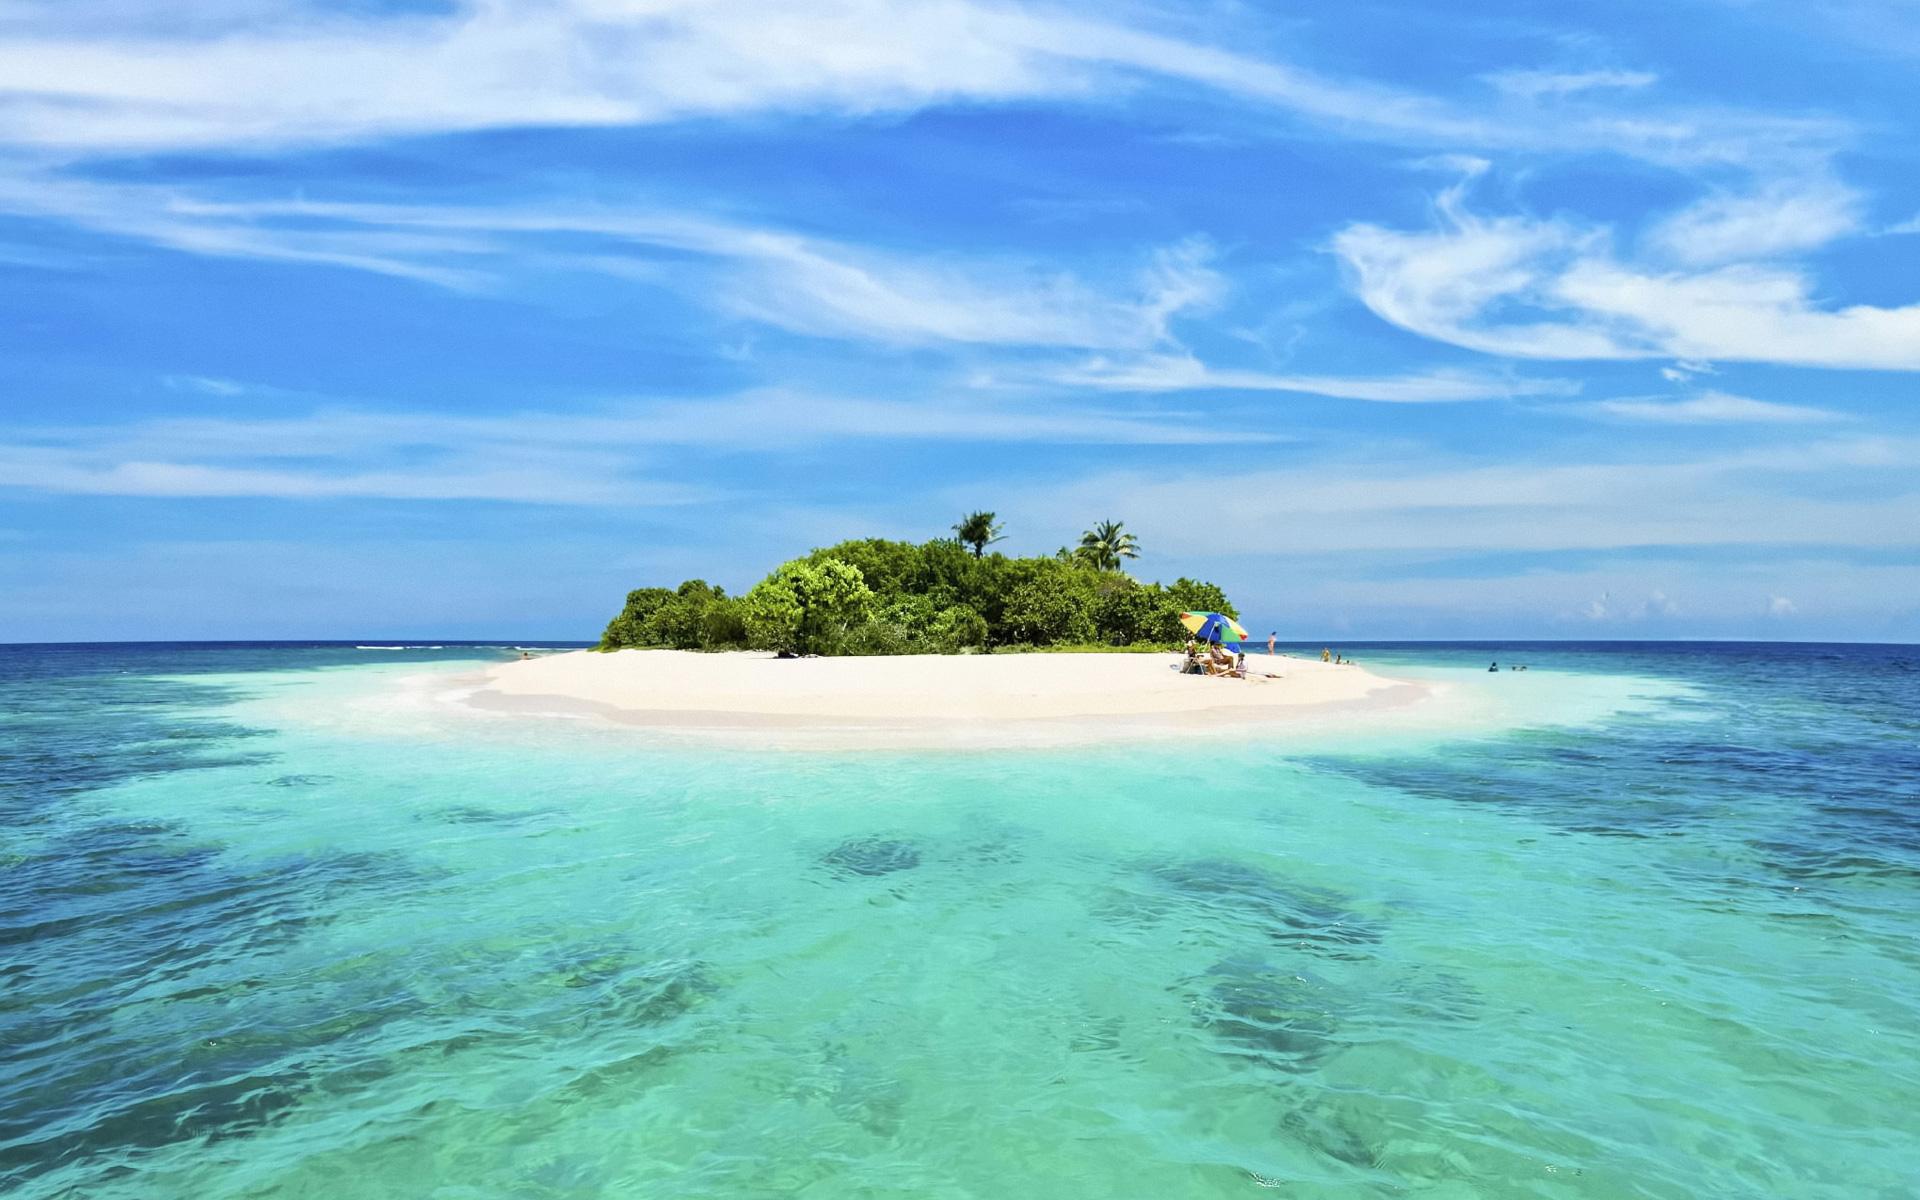 Ocean Art Contest Winners 2015Underwater Photography Guide